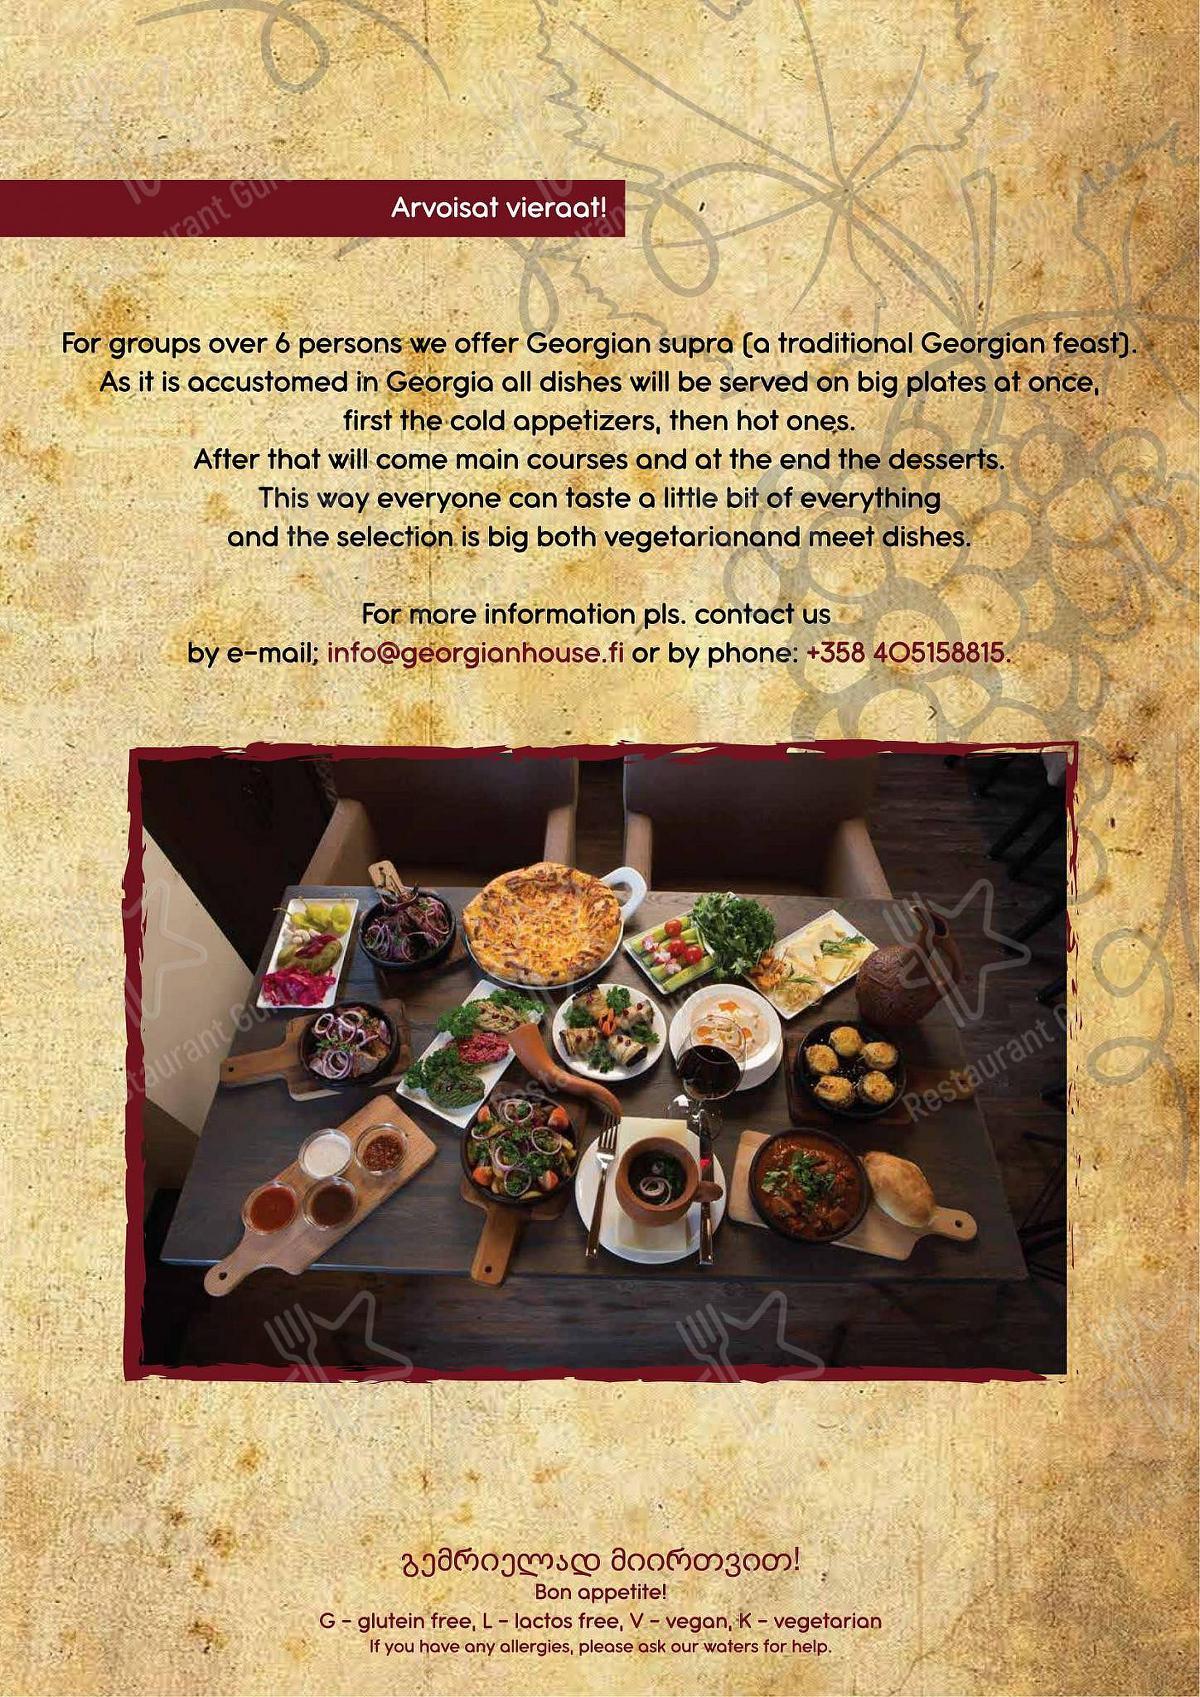 Georgian House menu - meals and drinks